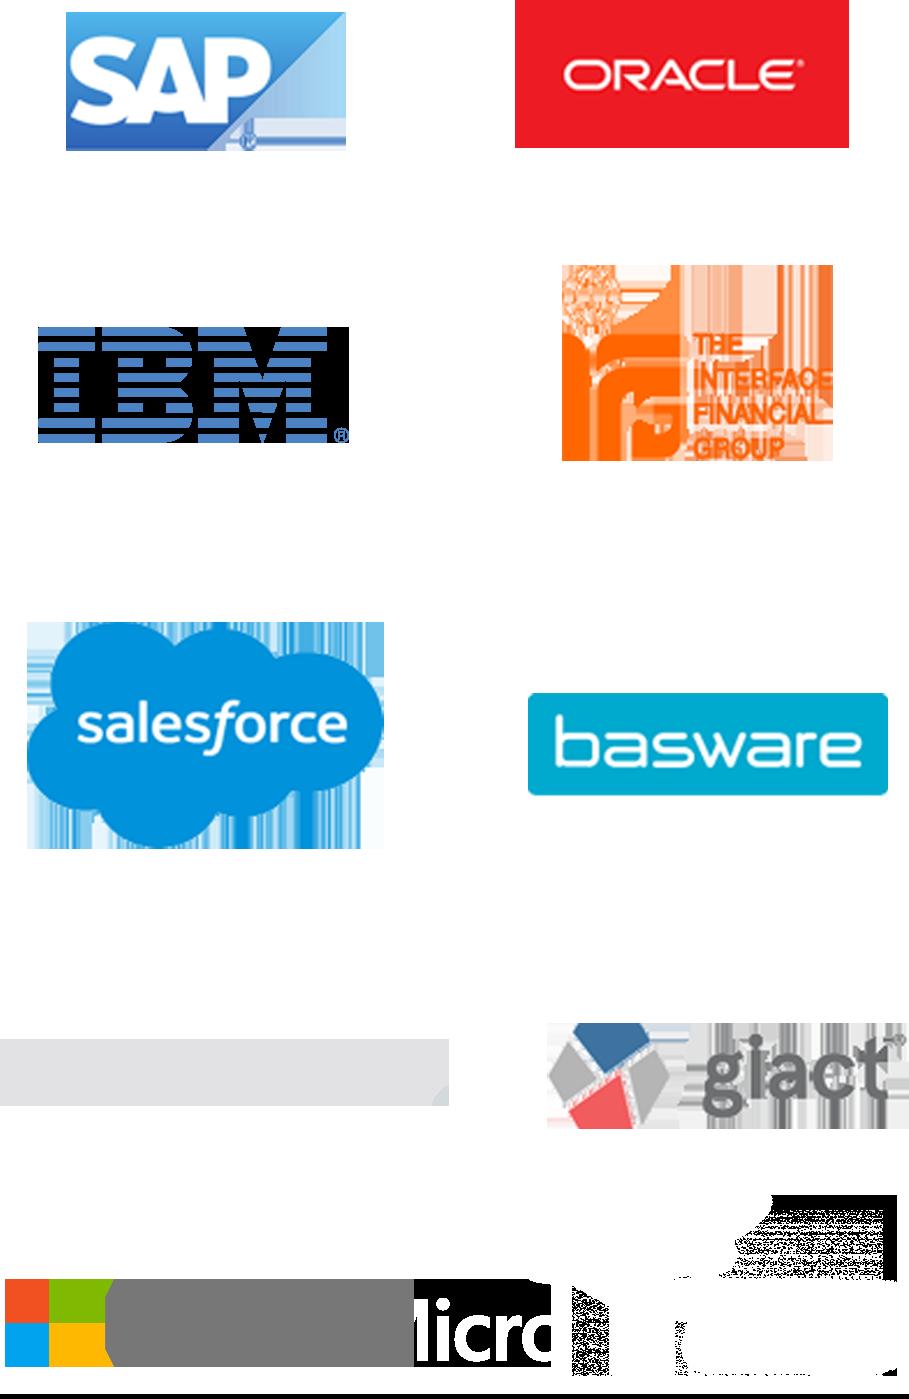 https://www.apexanalytix.com/sites/default/files/revslider/image/apex-partner-logos-mobile-July.png